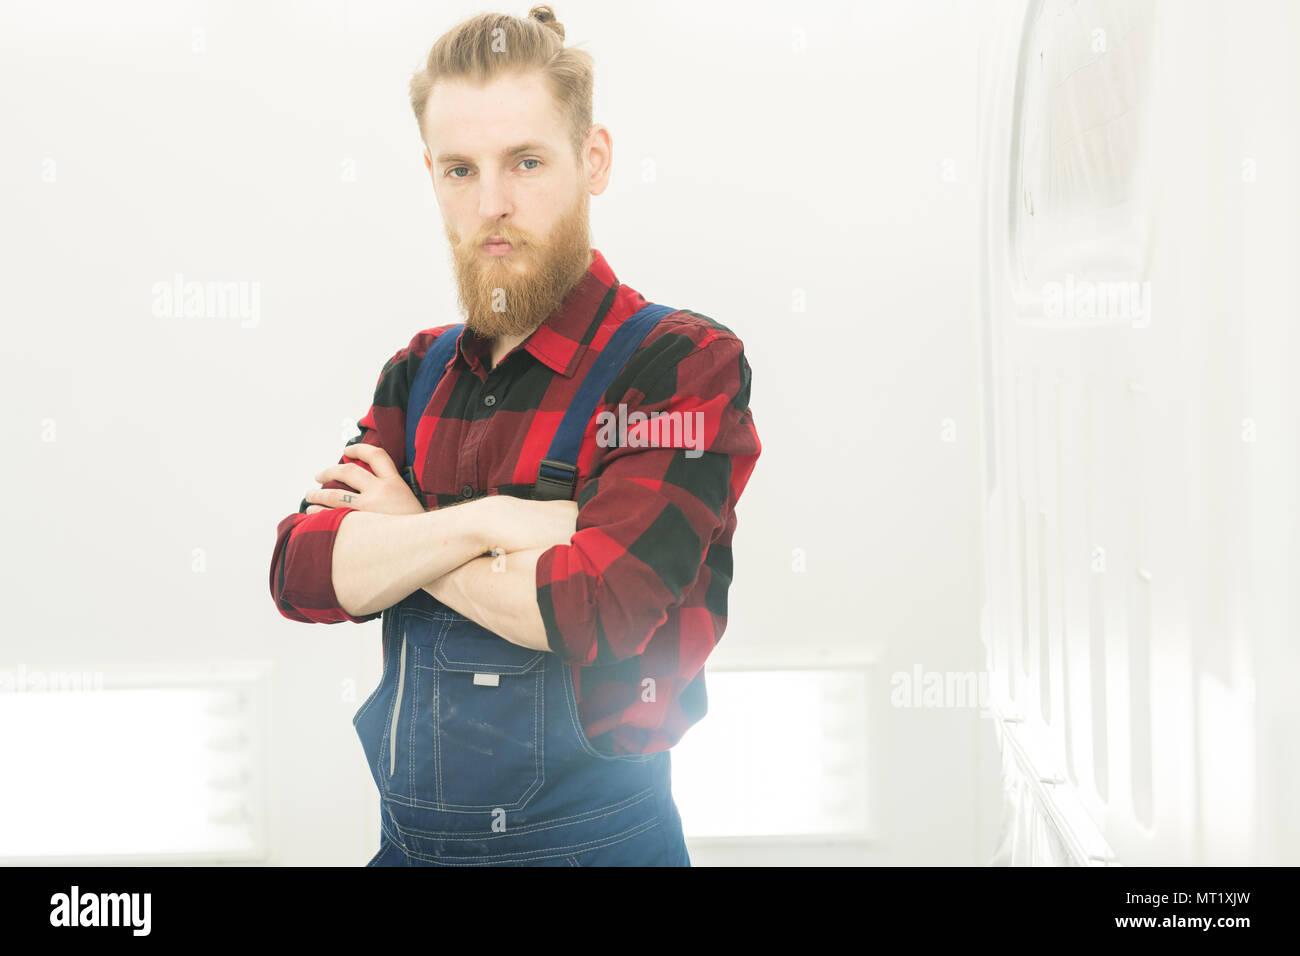 Confident Repairman At Work - Stock Image